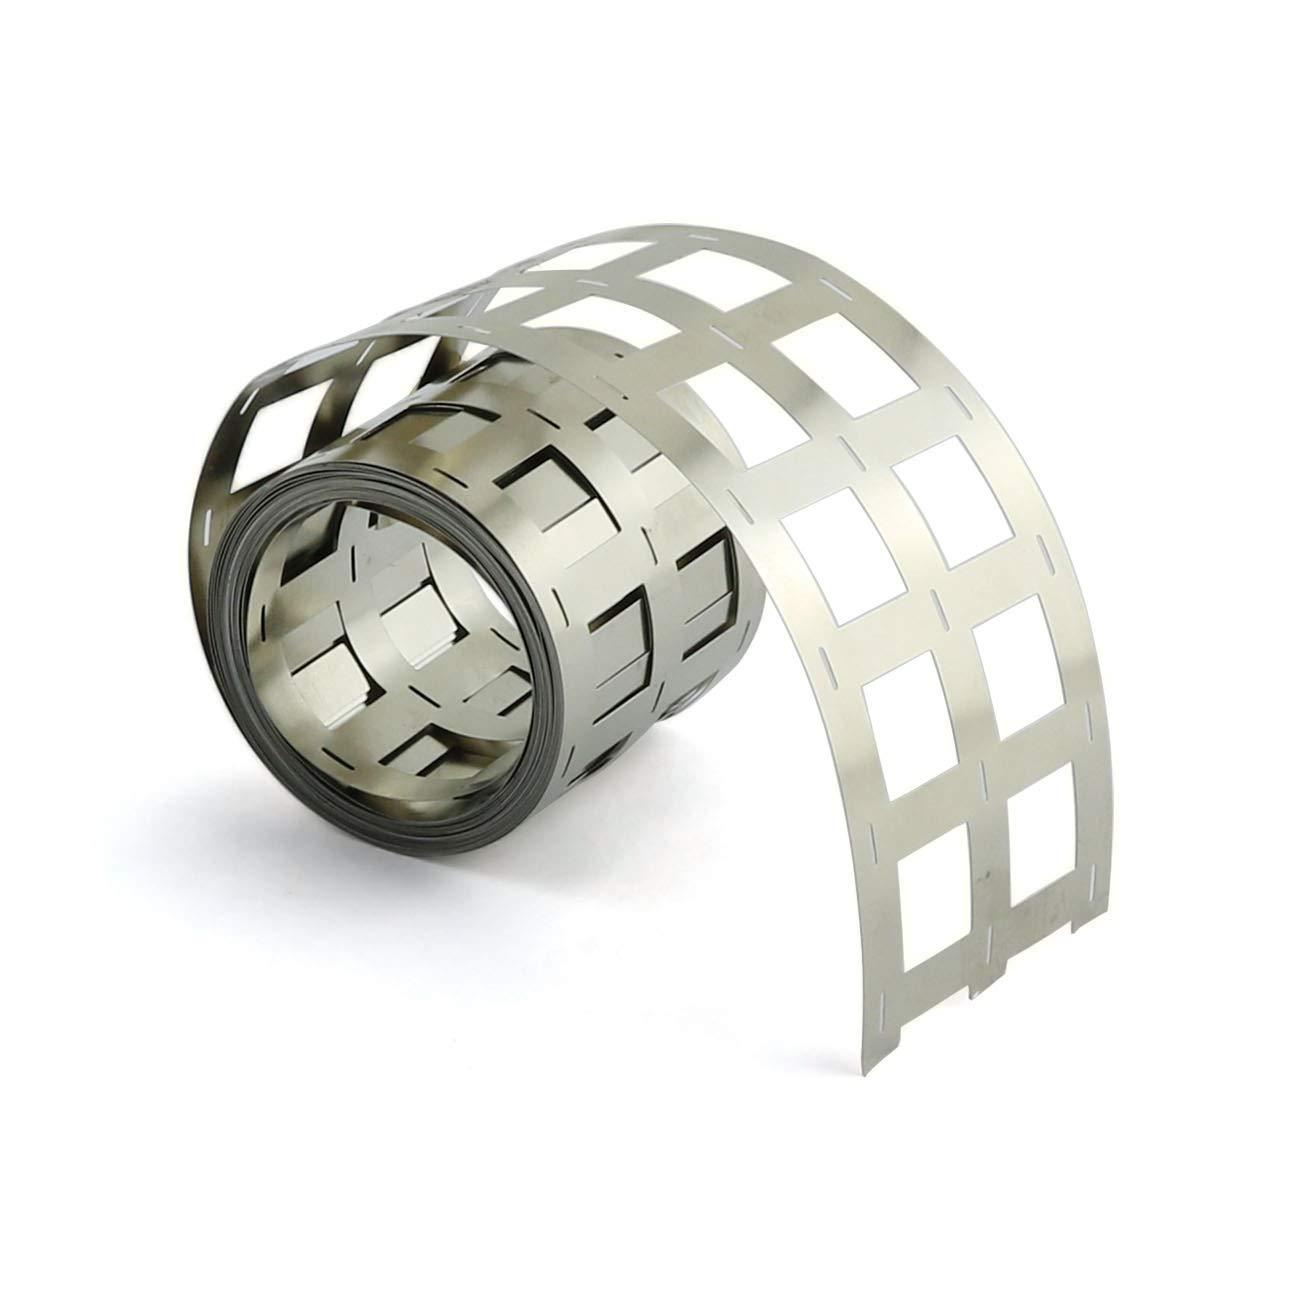 5M ZRM/&E 1 Roll 18650 Lithium Battery Pack Nickel Plating Strip 20.25mm Spacing 3 Parallel Batteries Spot Welding Nickel Plating Belt